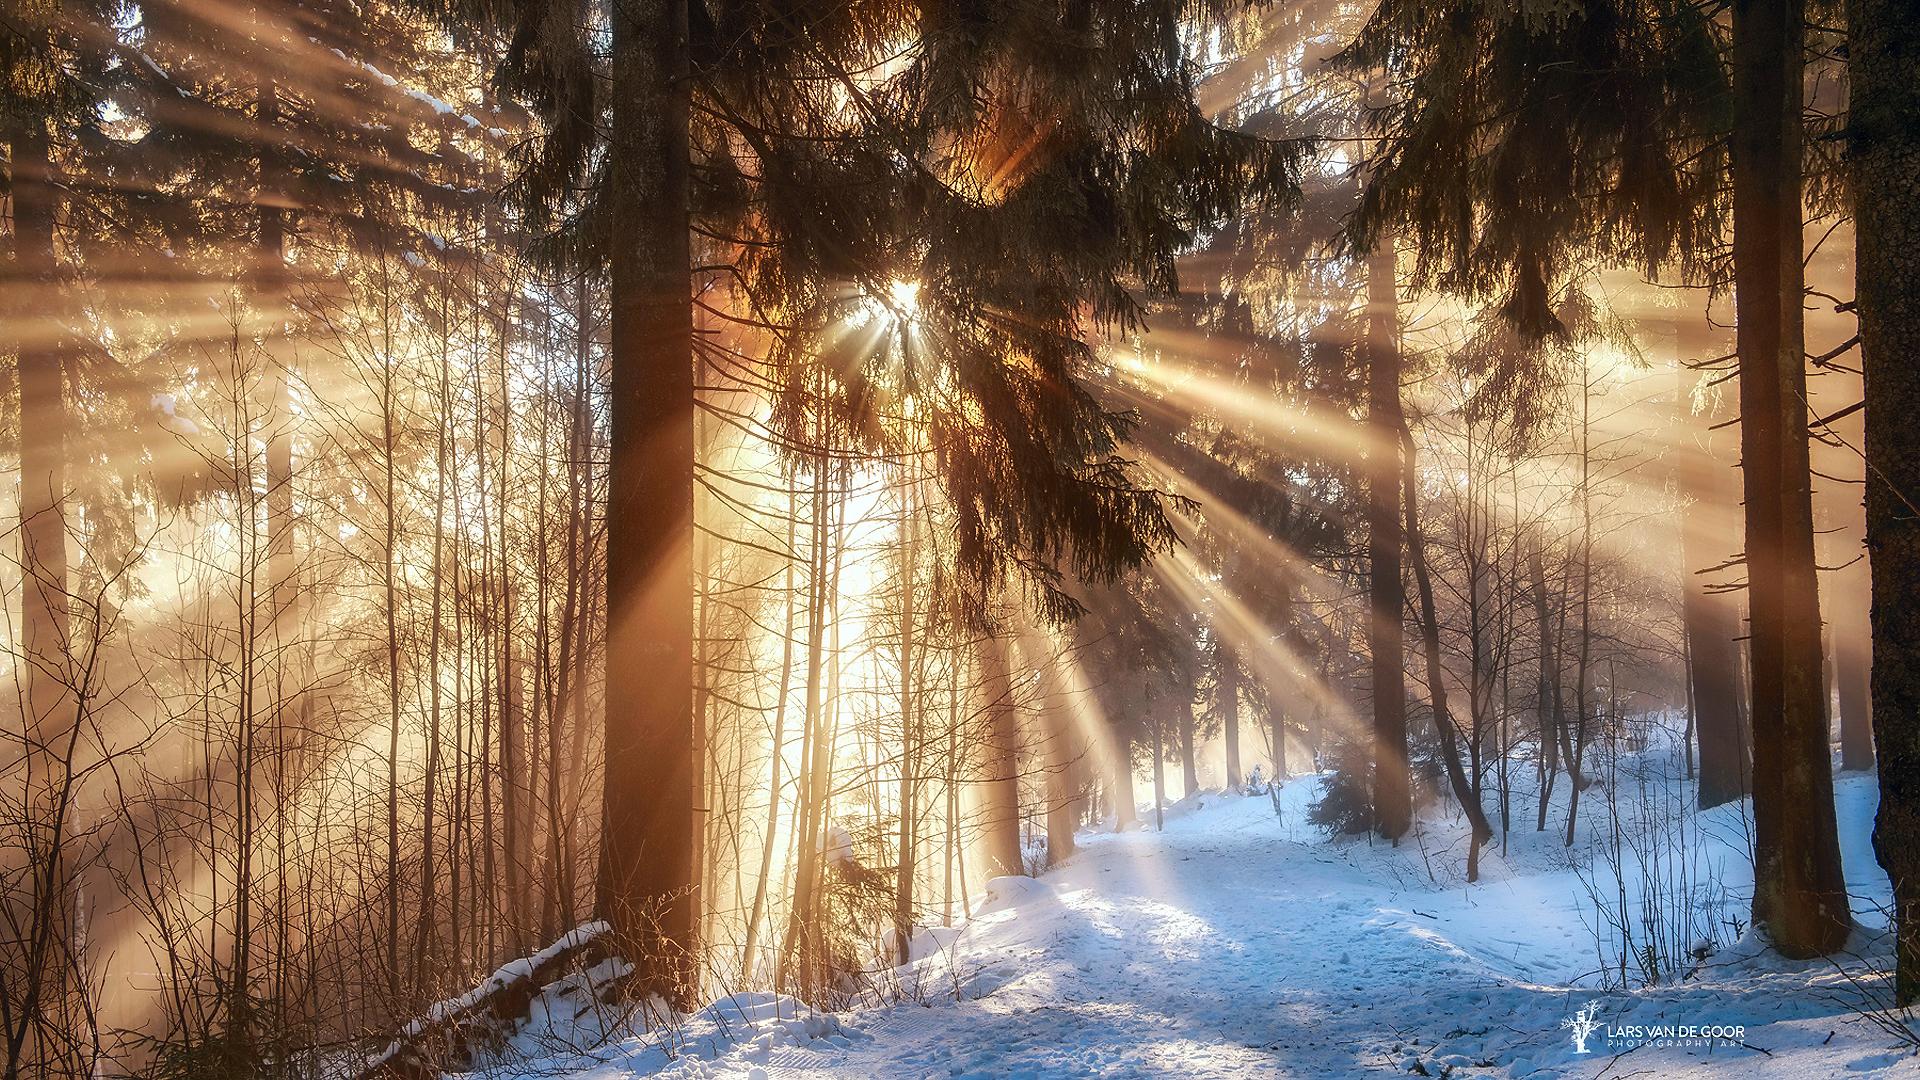 атмосфере лес в снегу под солнцем фото цилиндрической формы